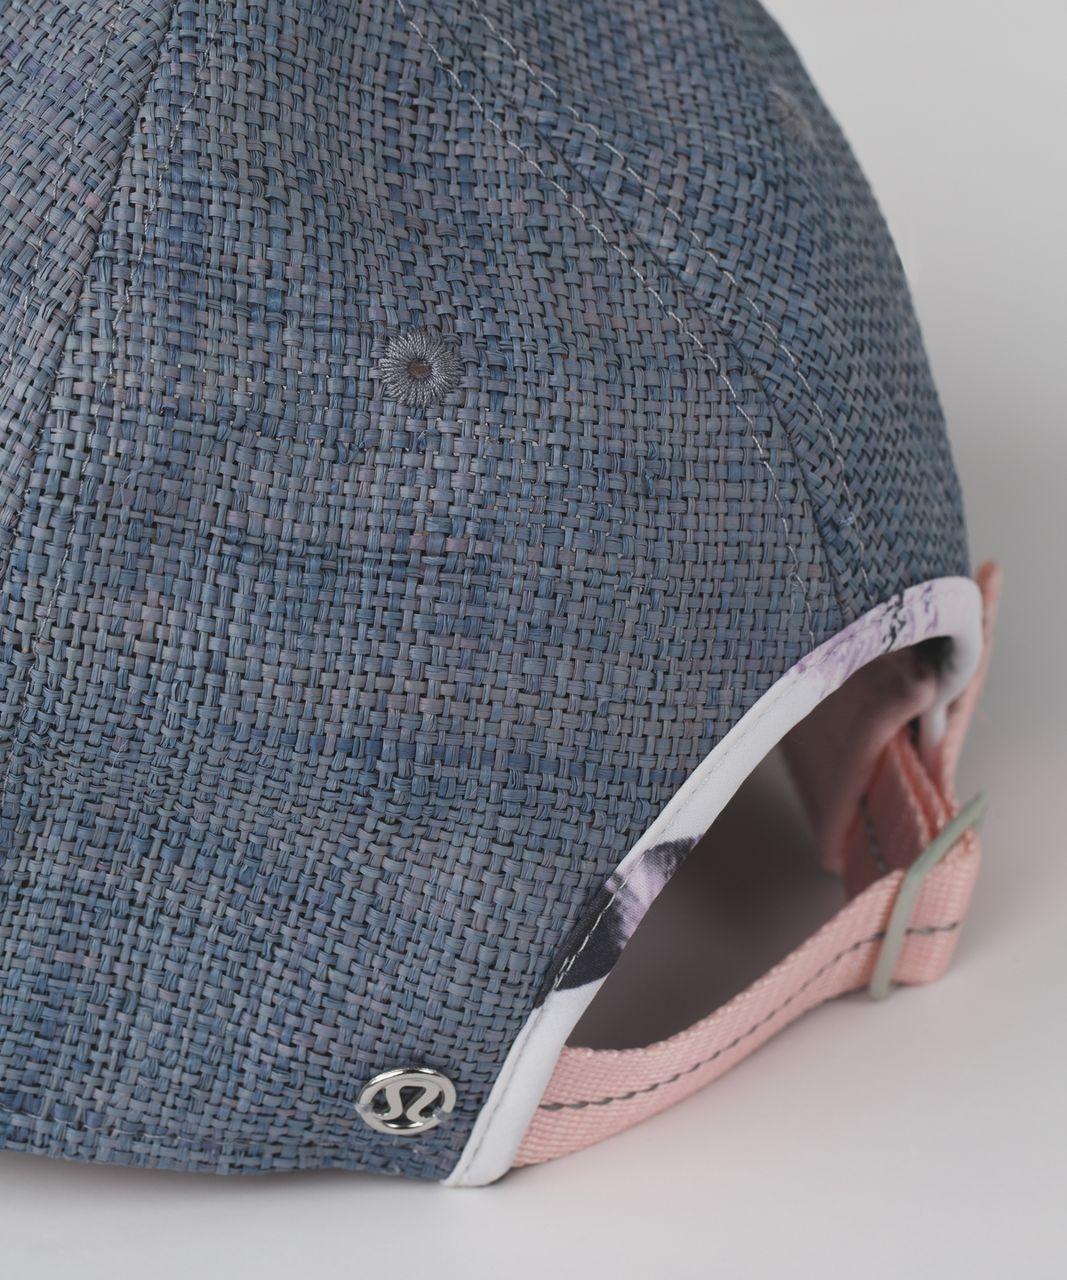 Lululemon Baller Hat *Straw - Sunset Stripe Blush Quartz Multi / Blush Quartz